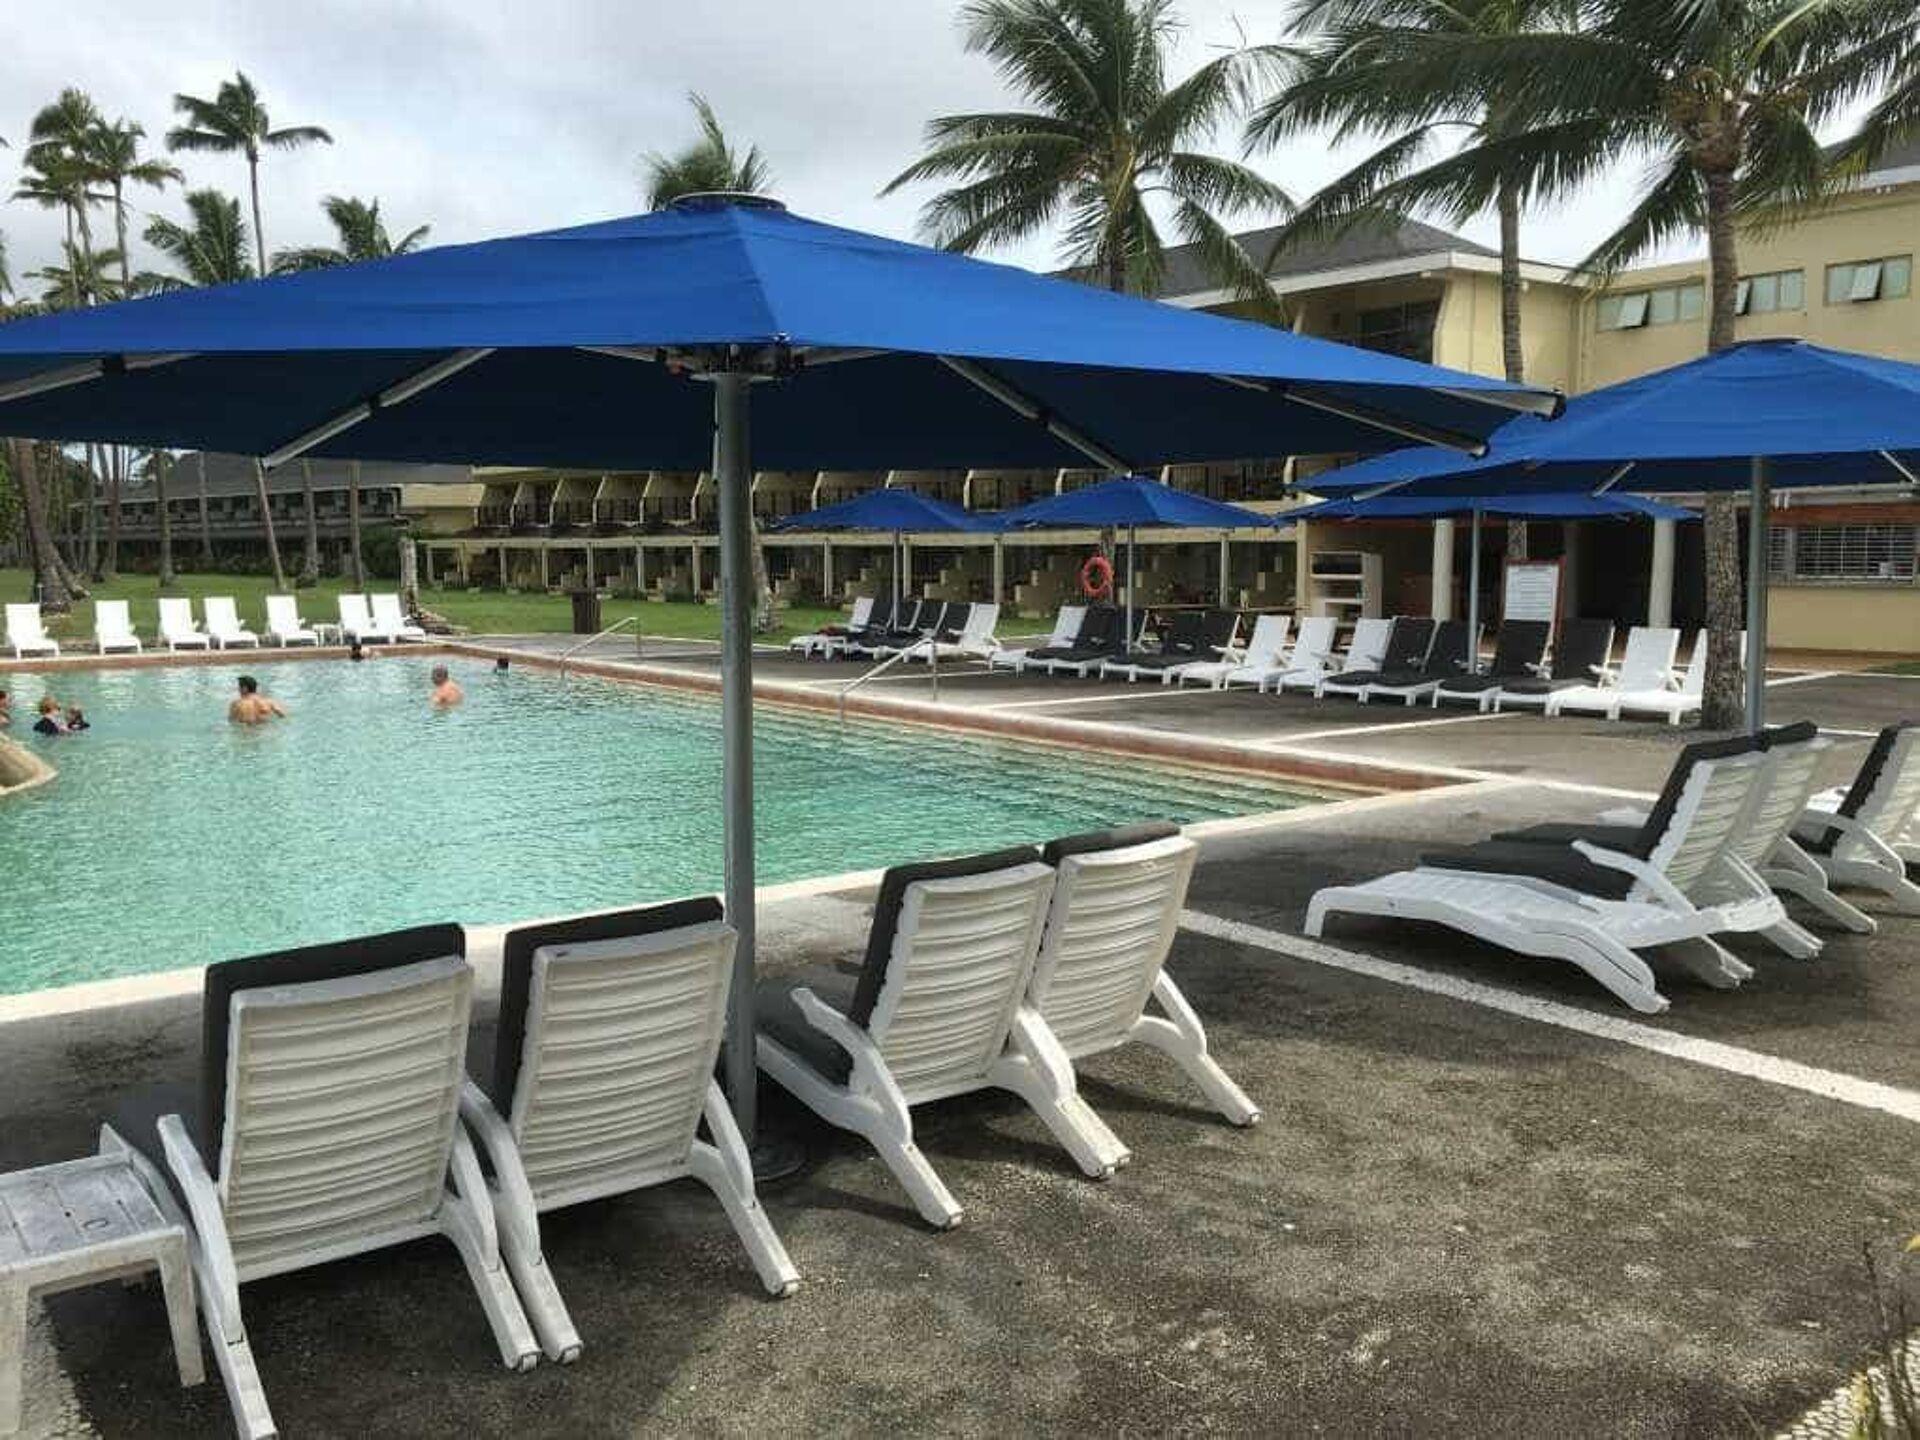 Shangri-La Resort Fiji Tempest Outdoor Umbrellas